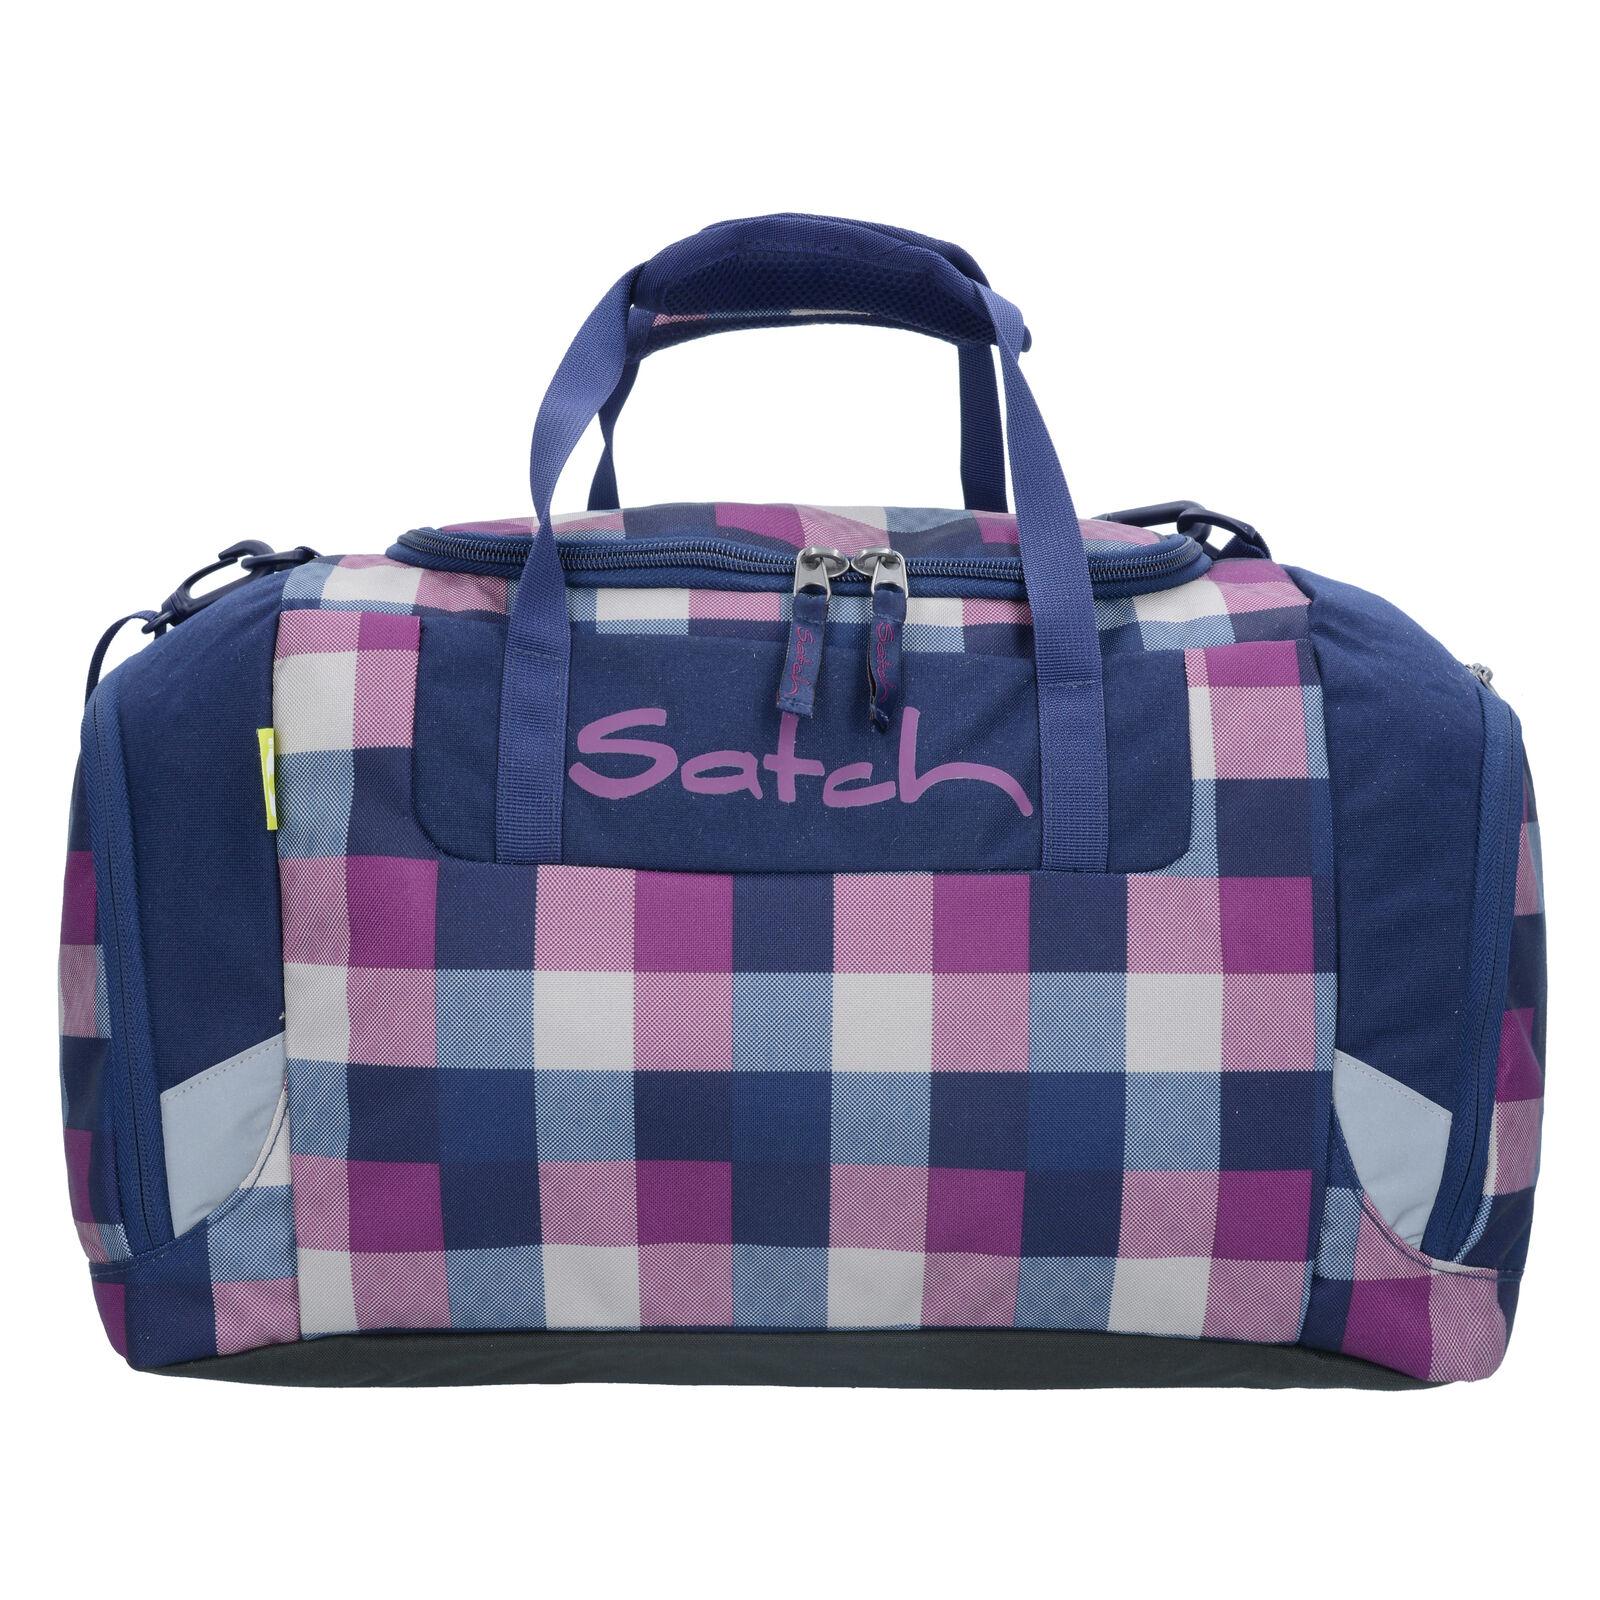 Satch Sports Bag 44 cm (karo purple blue berry carry)